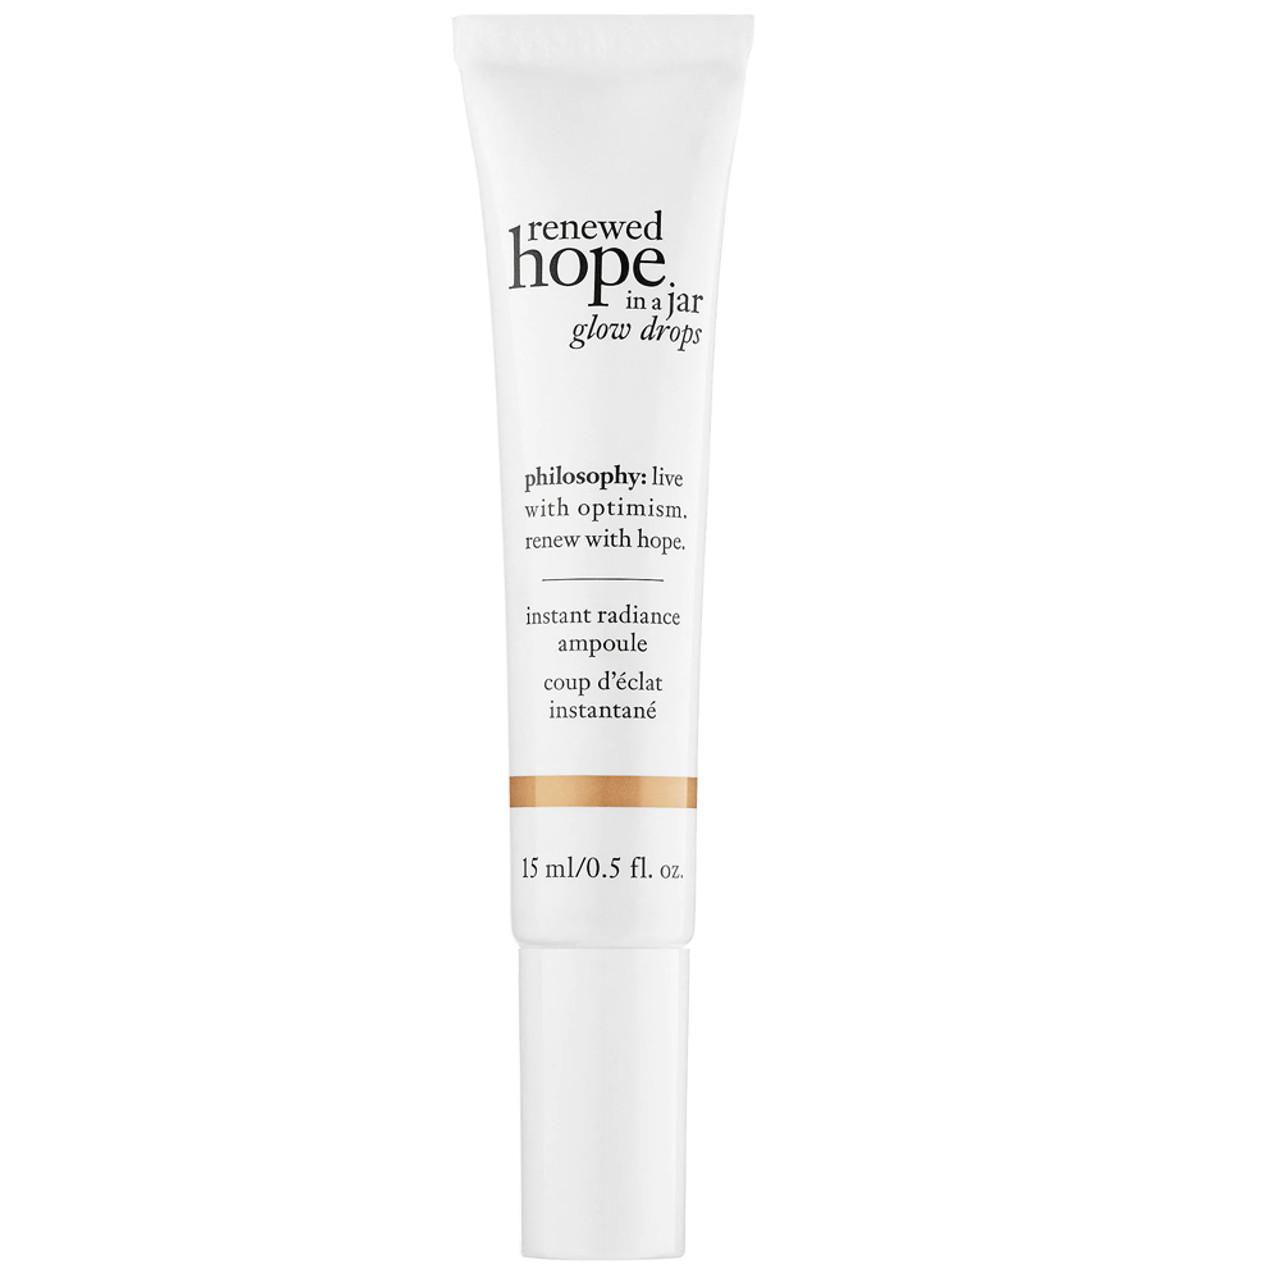 philosophy Renewed Hope in a Jar Glow Drops BeautifiedYou.com